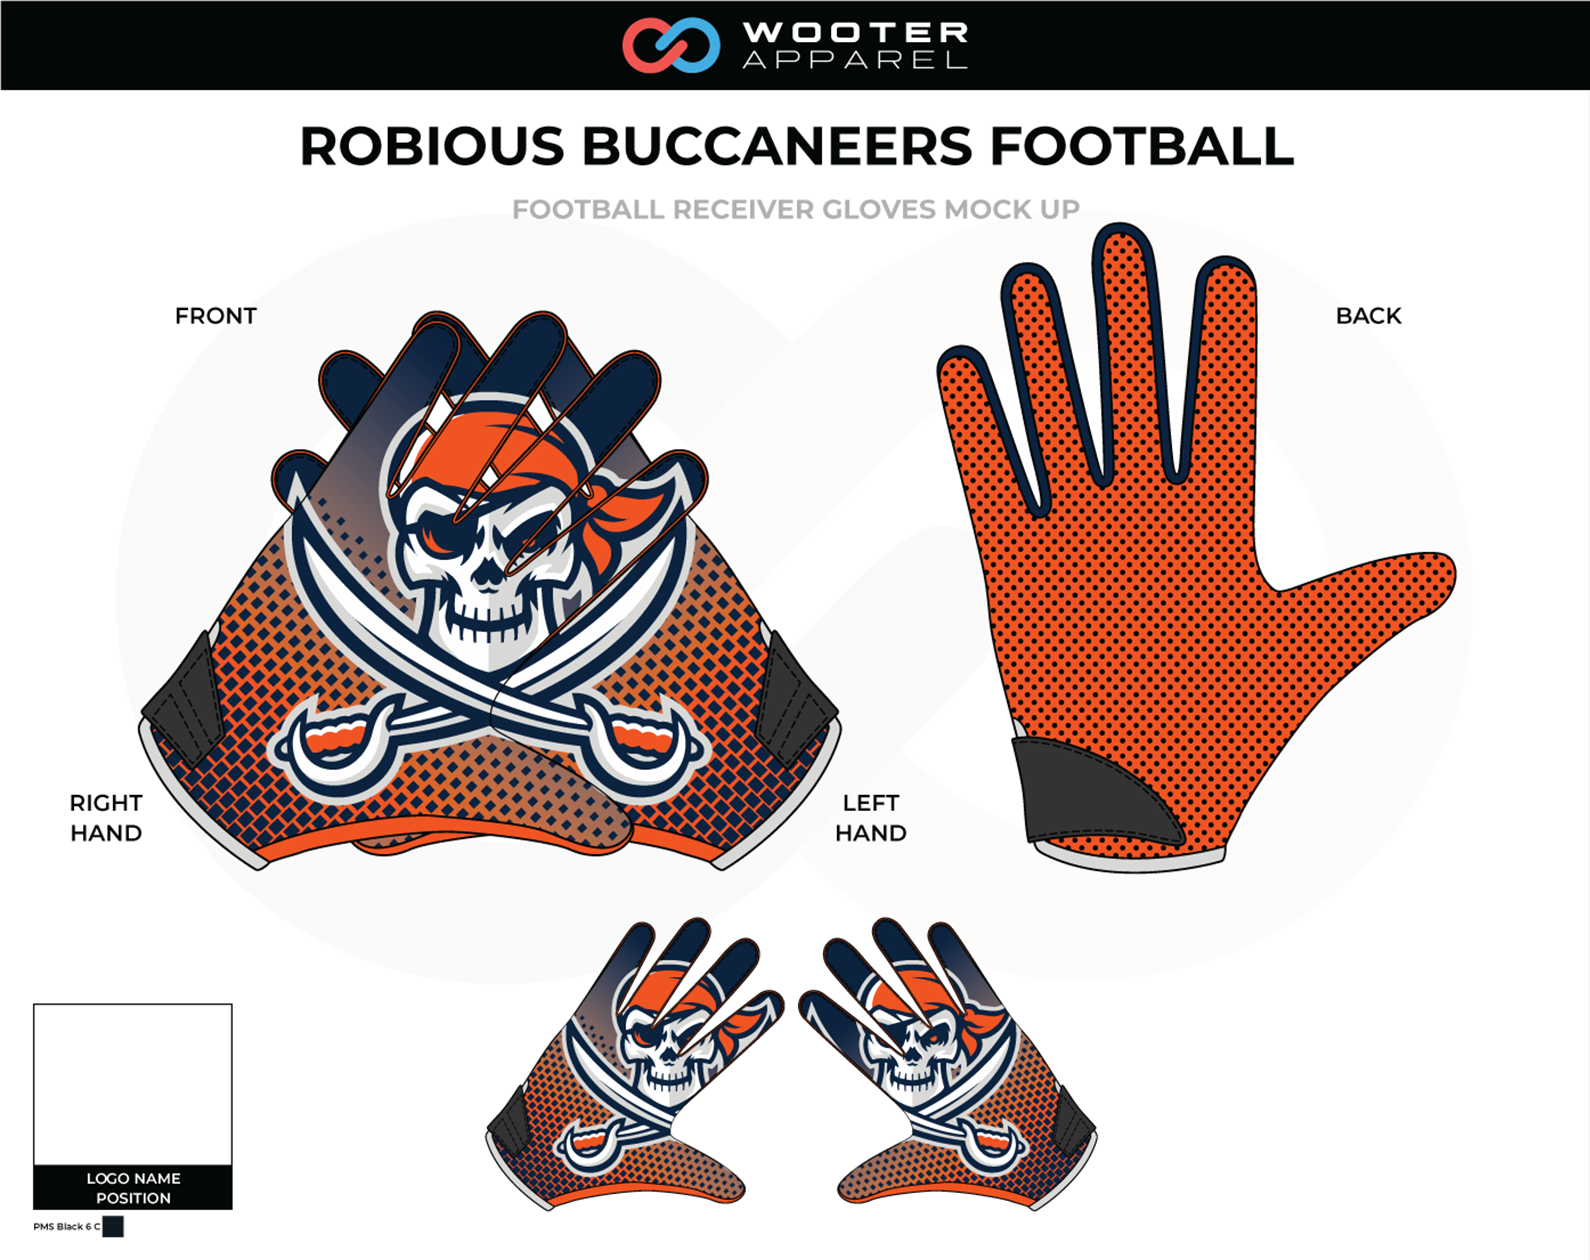 RobiousBuccaneersFootball_GloveMockup.png